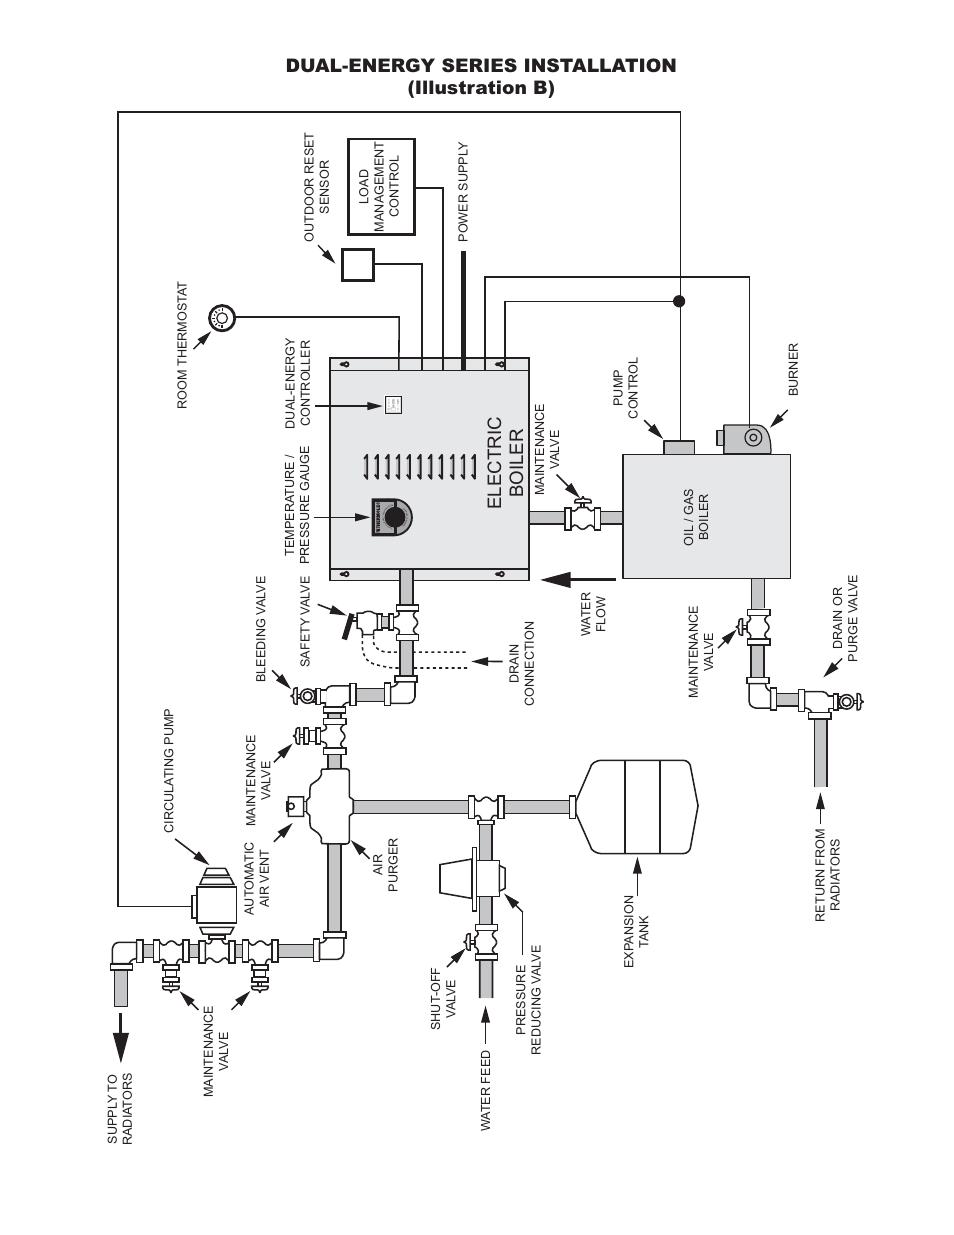 Thermolec Boiler Wiring Diagram Great Installation Of Amptec Electric Dual Energy Series Illustration B Rh Manualsdir Com